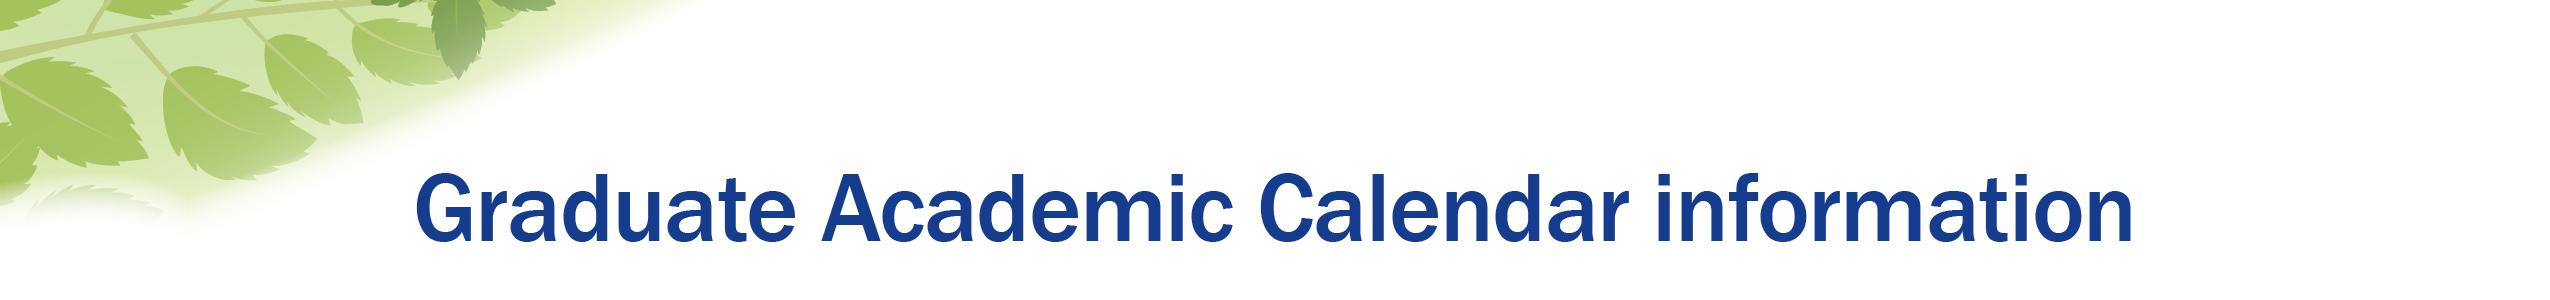 Graduate Academic Calendar Header